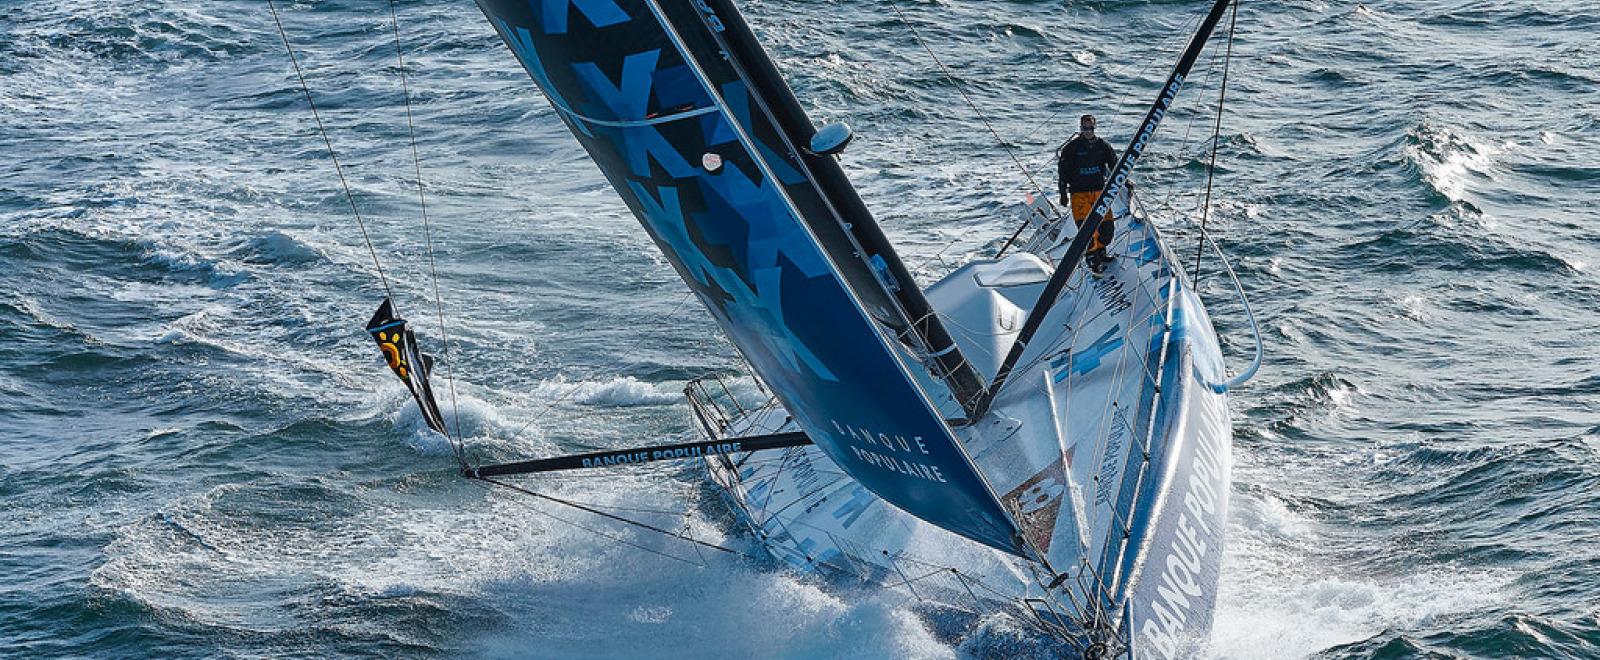 News - The Vendée Globe 2016-17: how the race was won - Vendée Globe - En